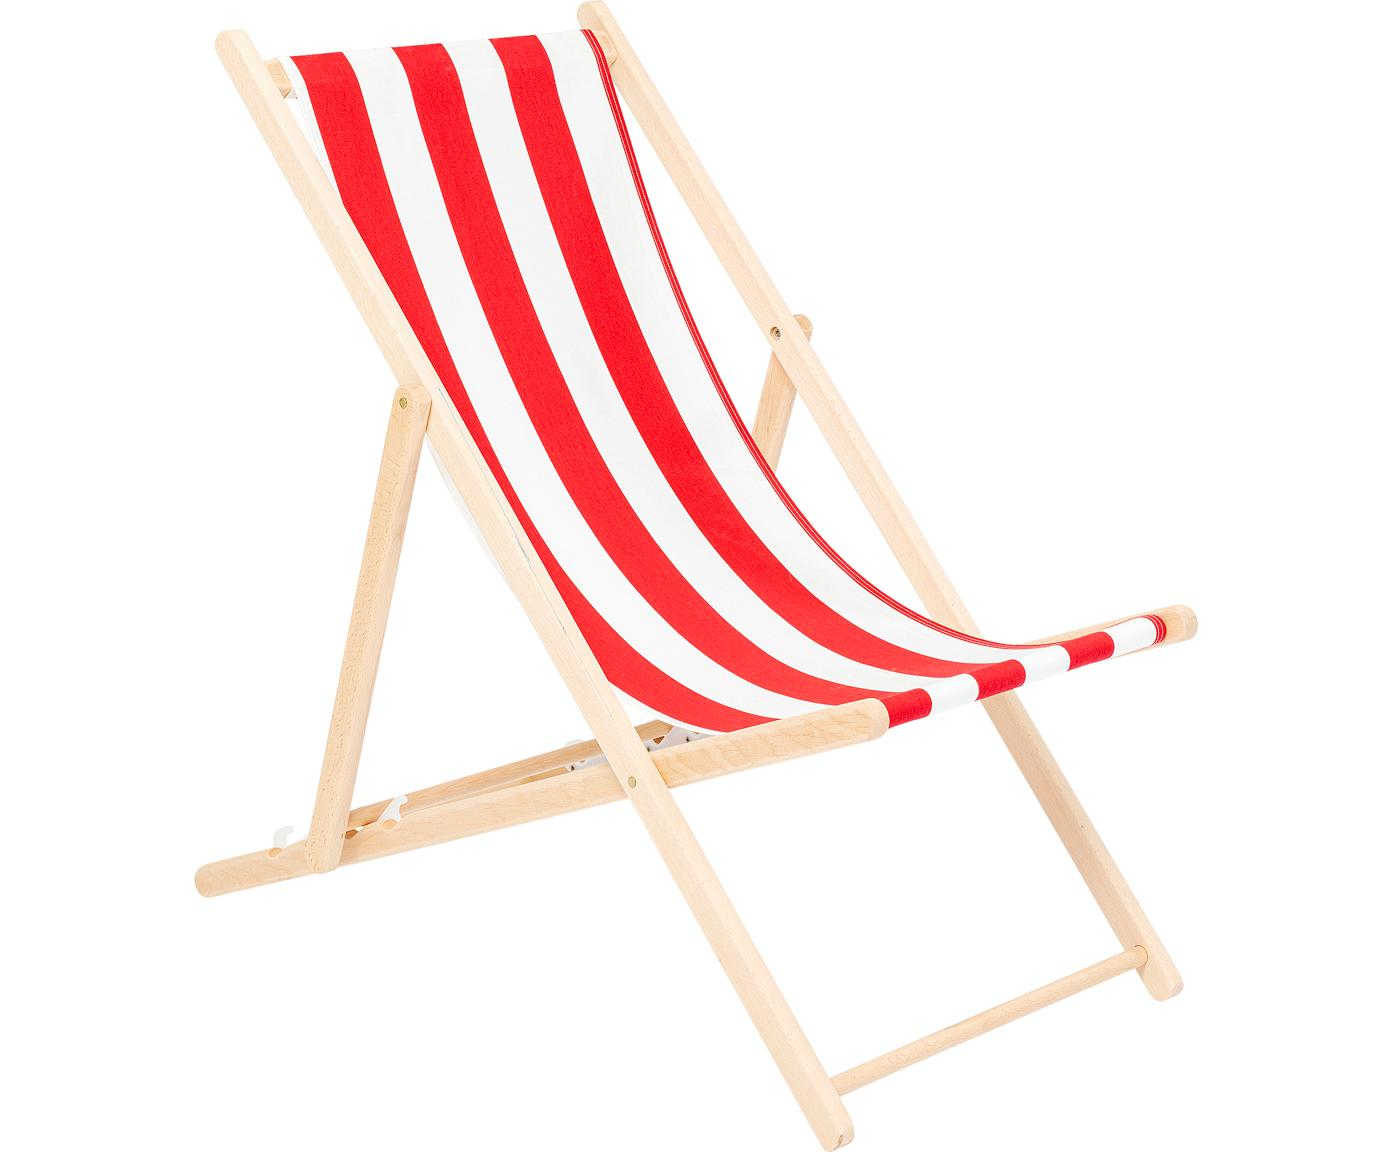 Klapbare ligstoel Hot Summer, Frame: beukenhout, Rood, wit, beukenhoutkleurig, B 96 x D 56 cm